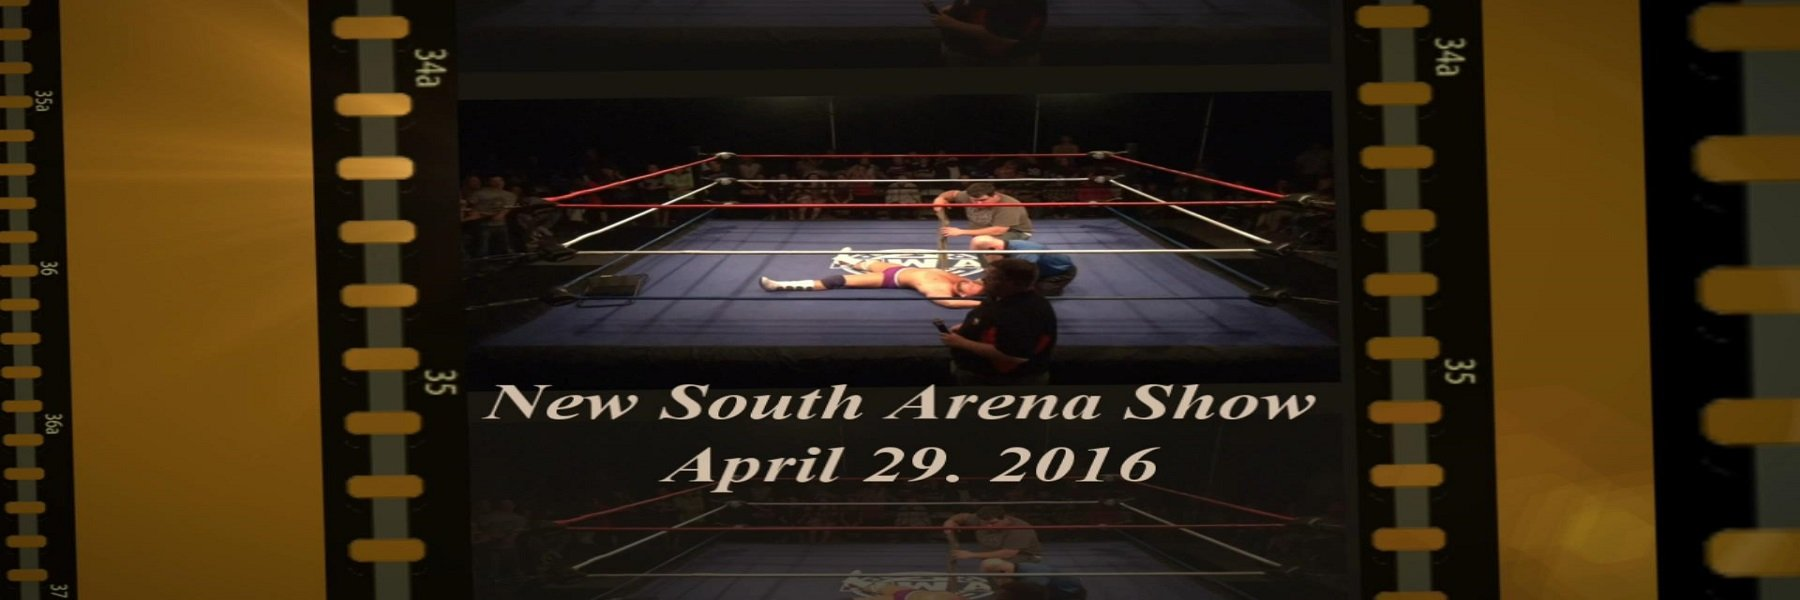 Arena Show April 29 2016